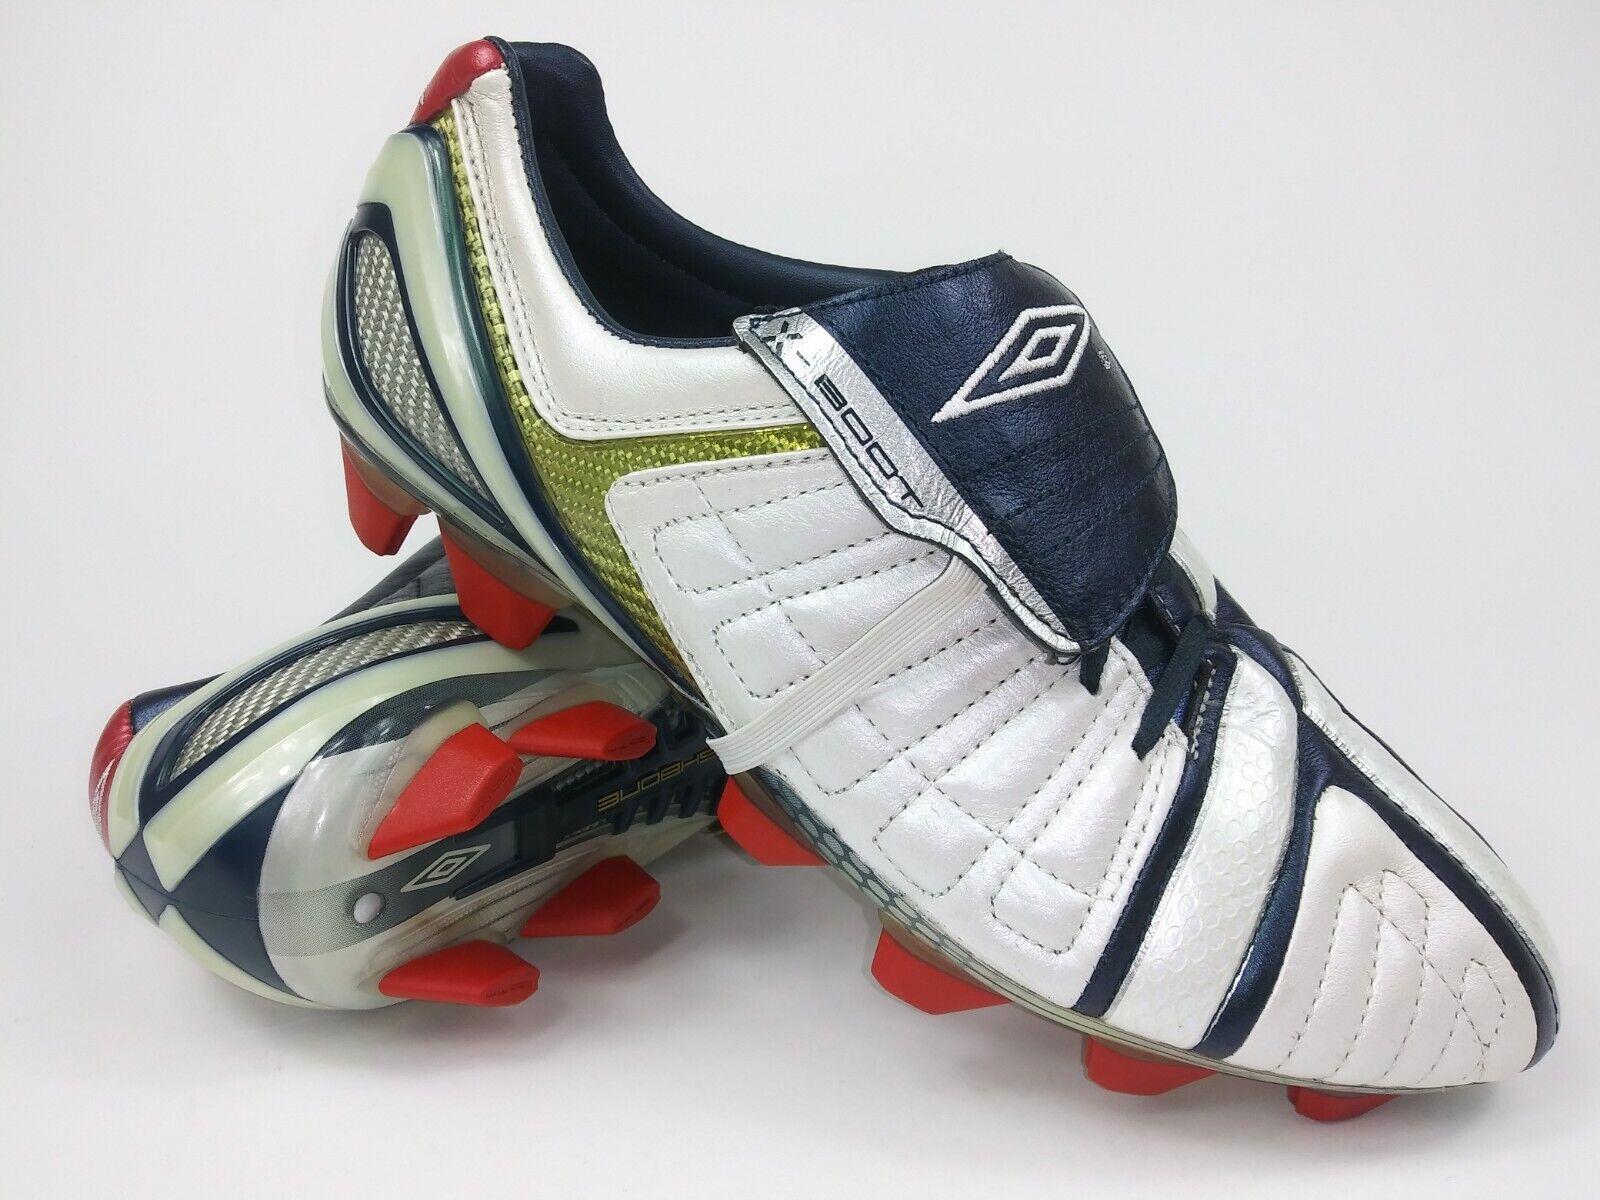 Umbro Mens Rare X avvio ll  A KTK Leather FG 8861943W9 blu bianca Soccer Cleats